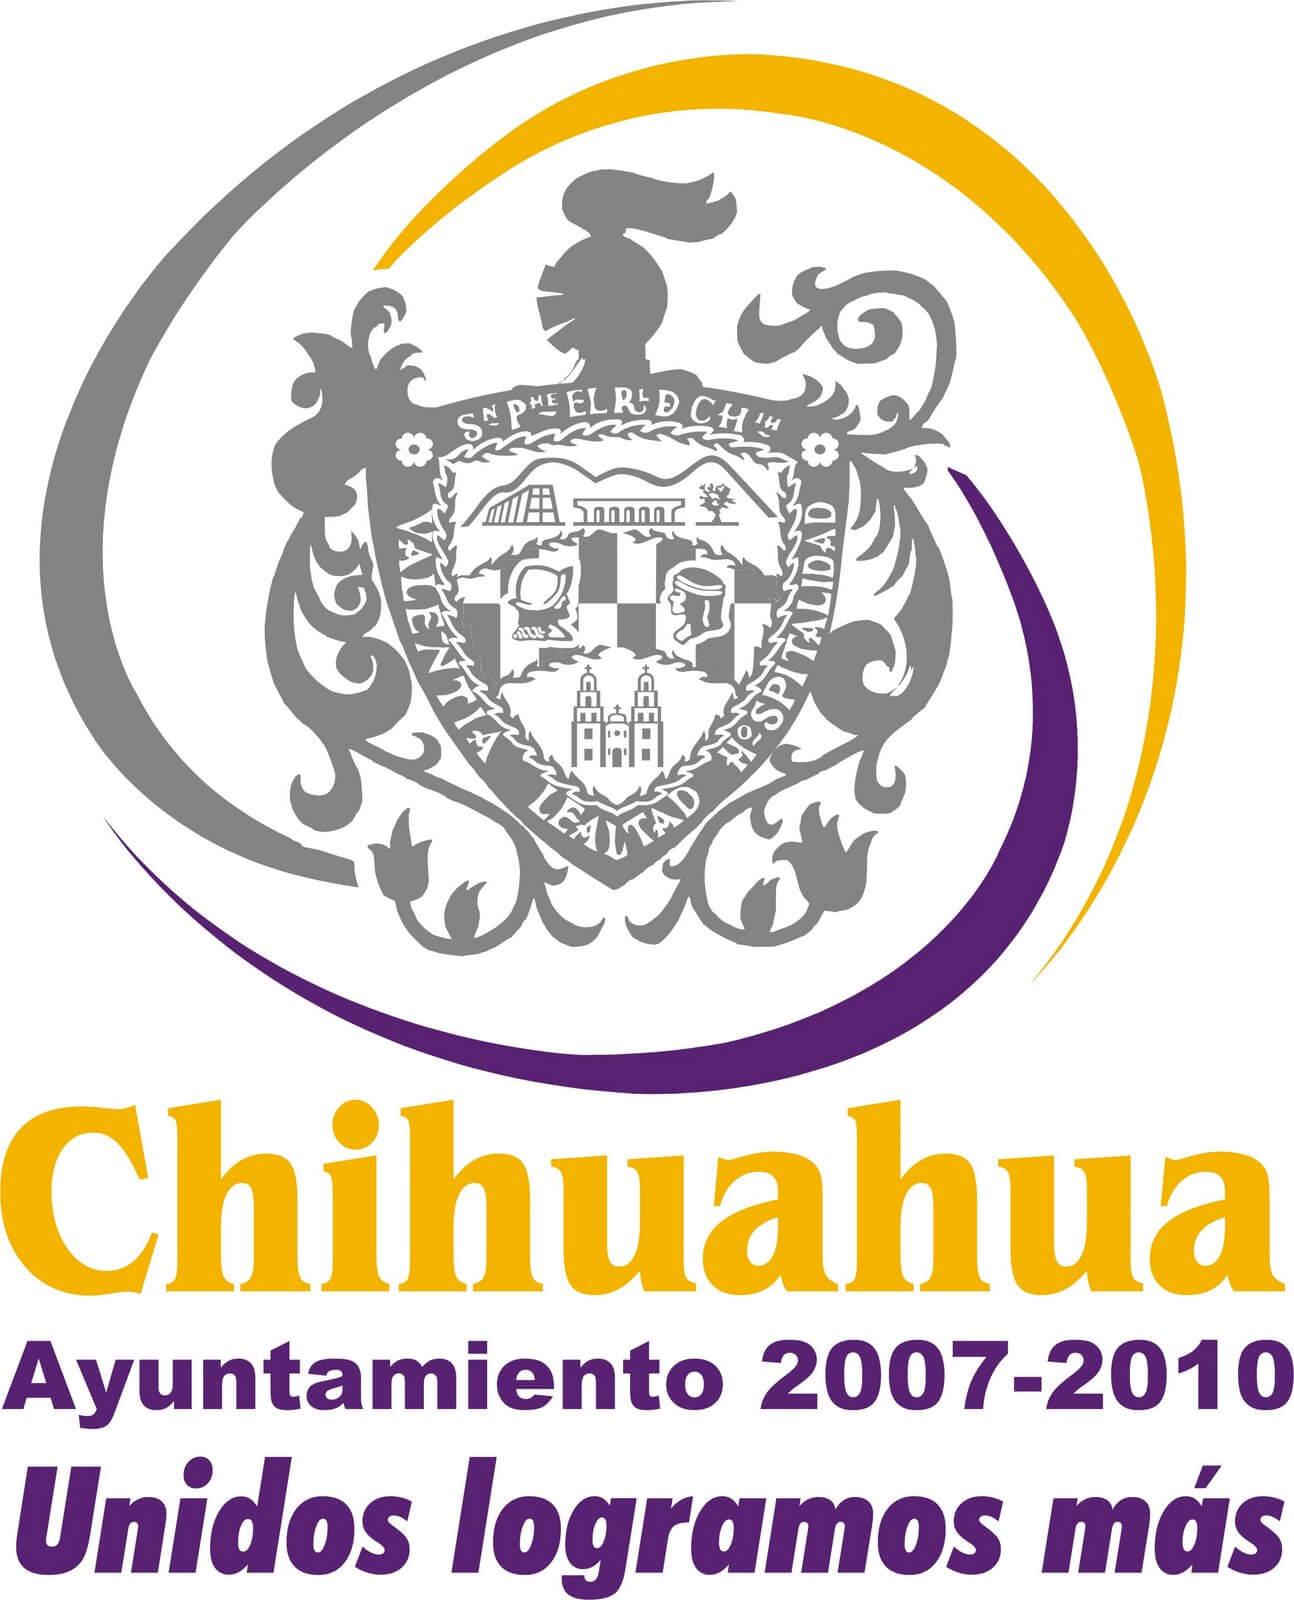 Ayuntamiento Chihuahua